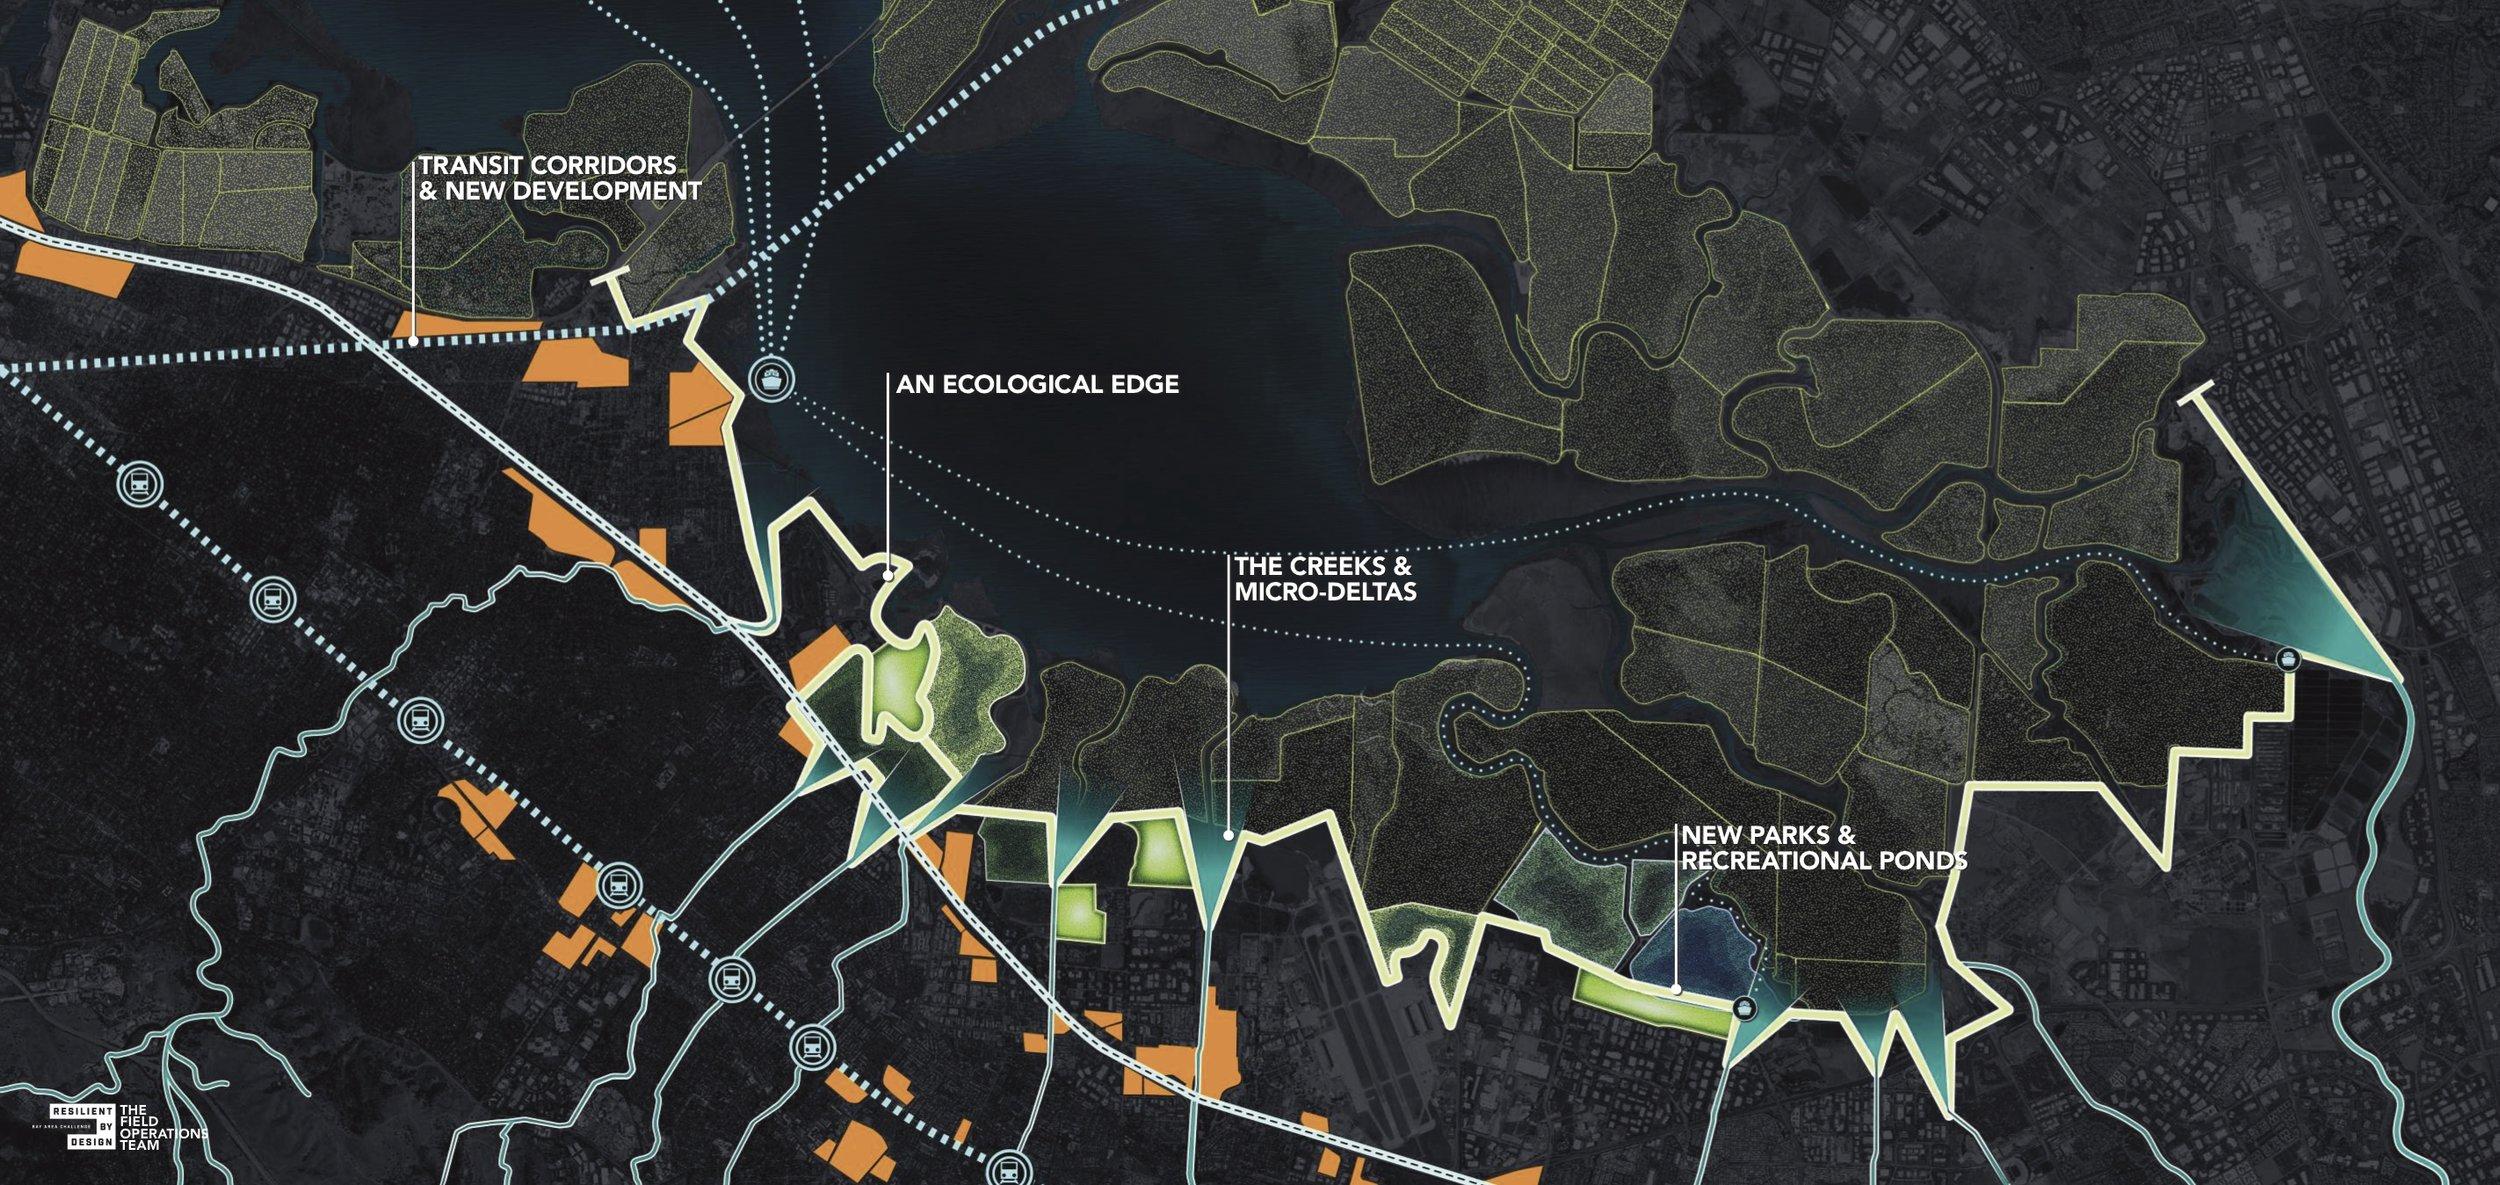 RBD_TheFieldOperationsTeam-SOUTHBAYTOWNS sml.jpg